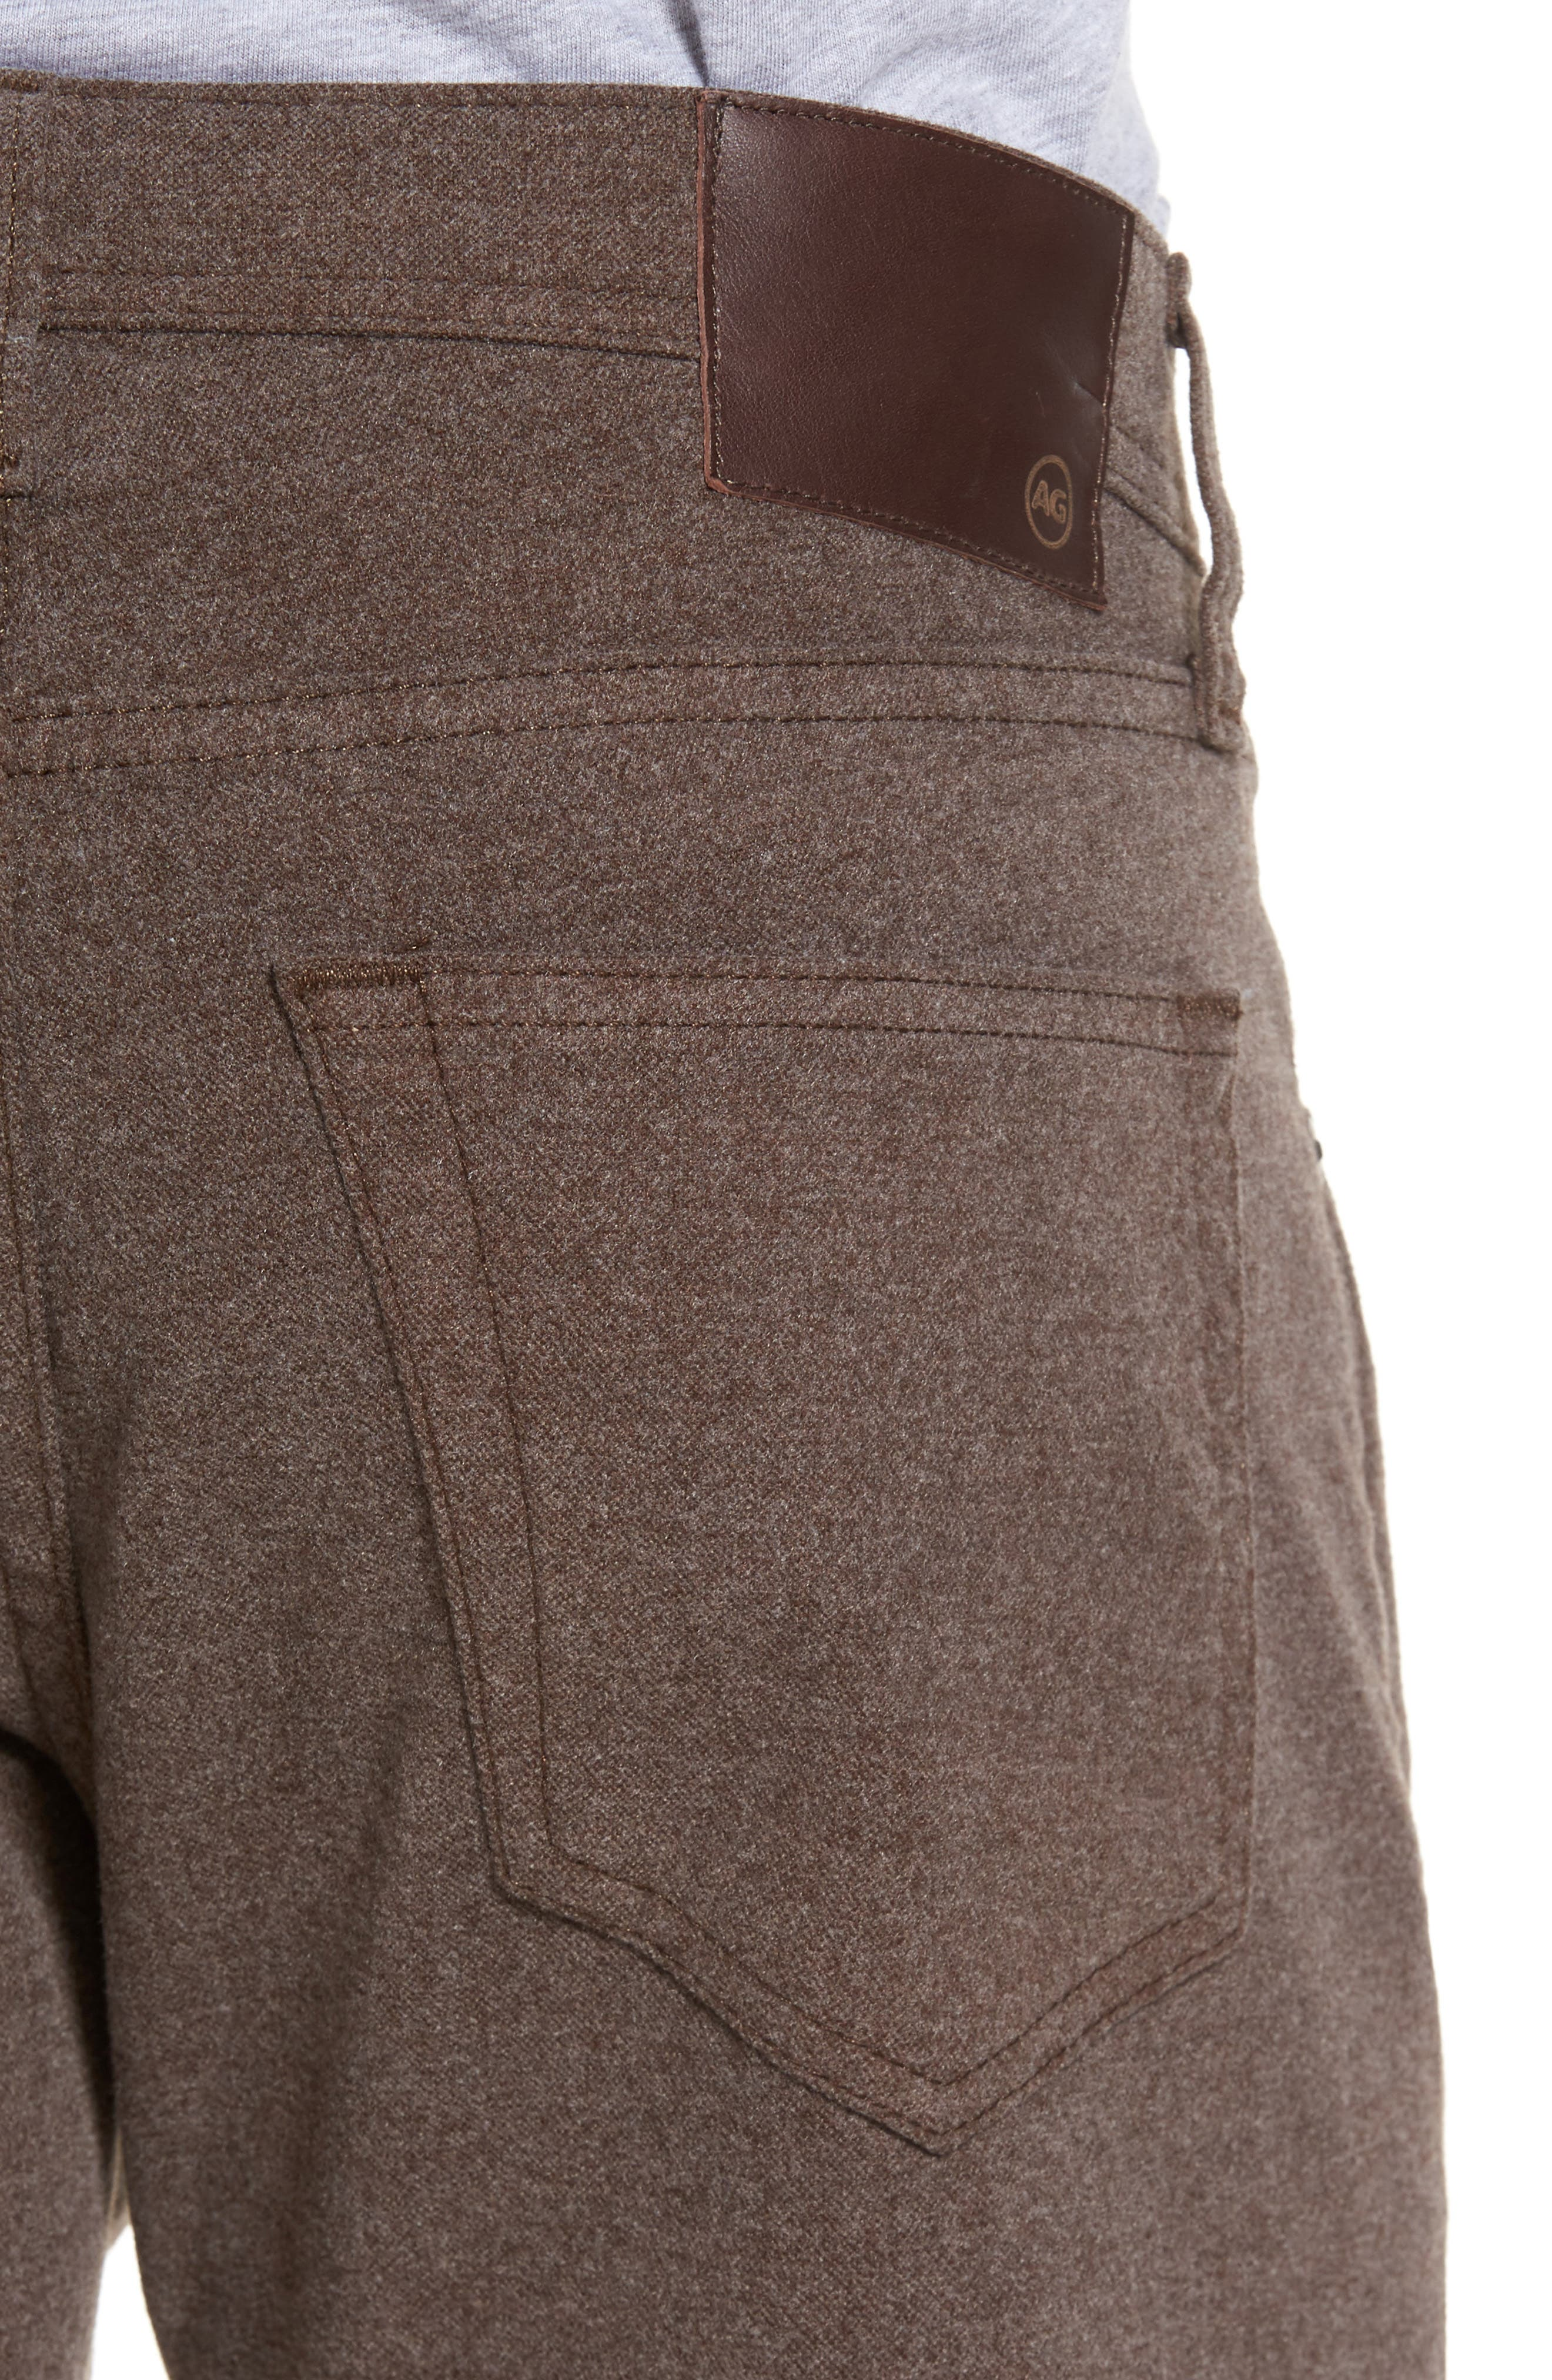 Tellis Slim Fit Five-Pocket Pants,                             Alternate thumbnail 15, color,